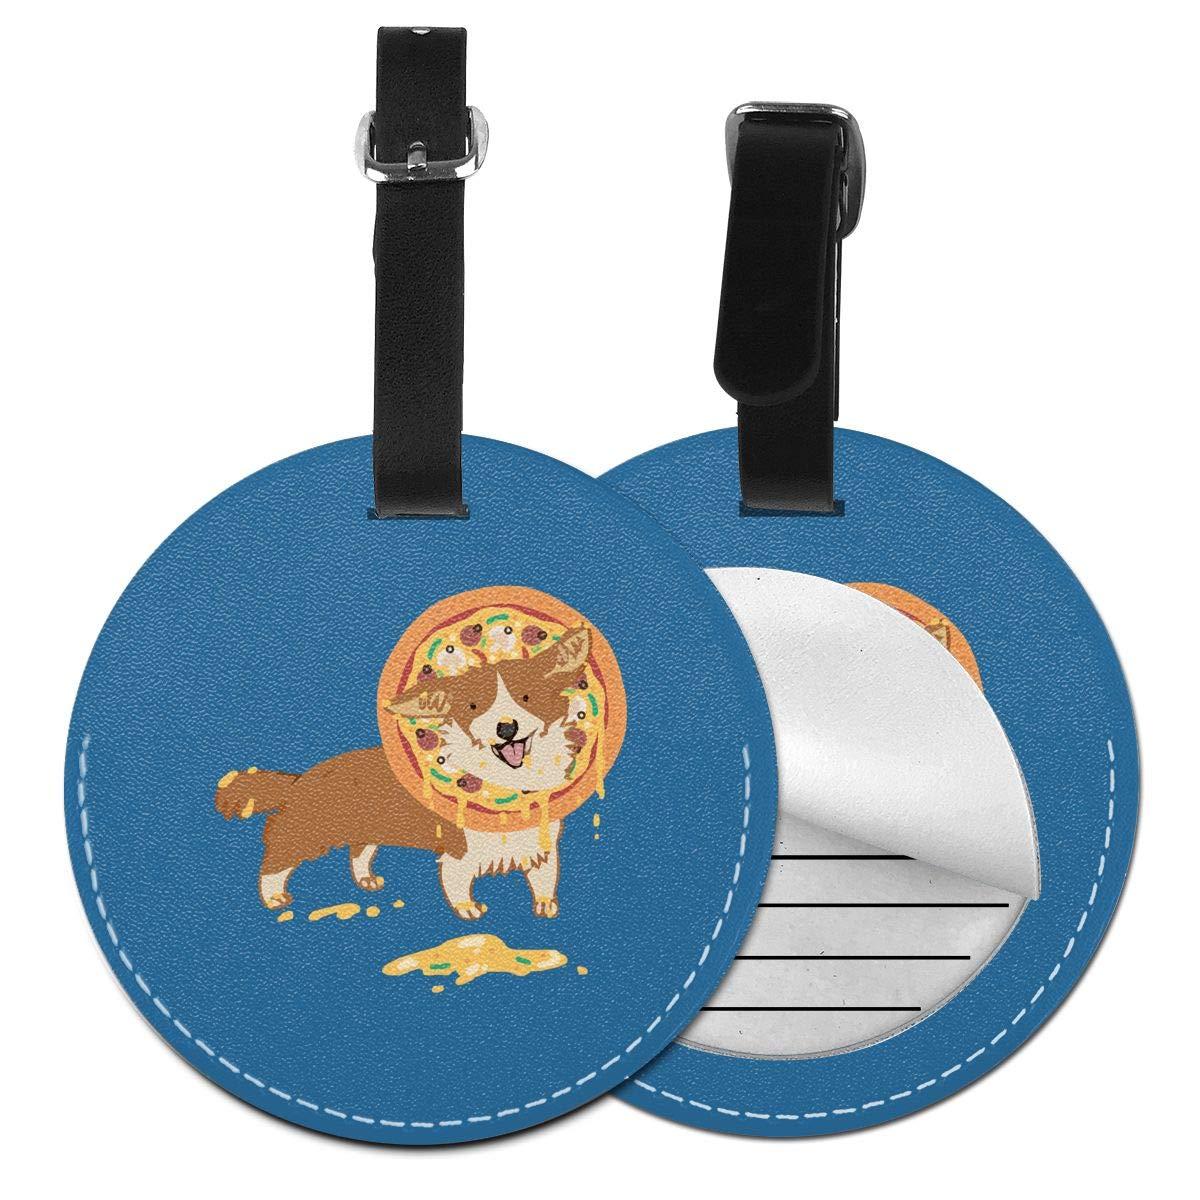 1pcs,2pcs,4pcs Pizza Corgi Pu Leather Double Sides Print Round Luggage Tag Mutilple Packs